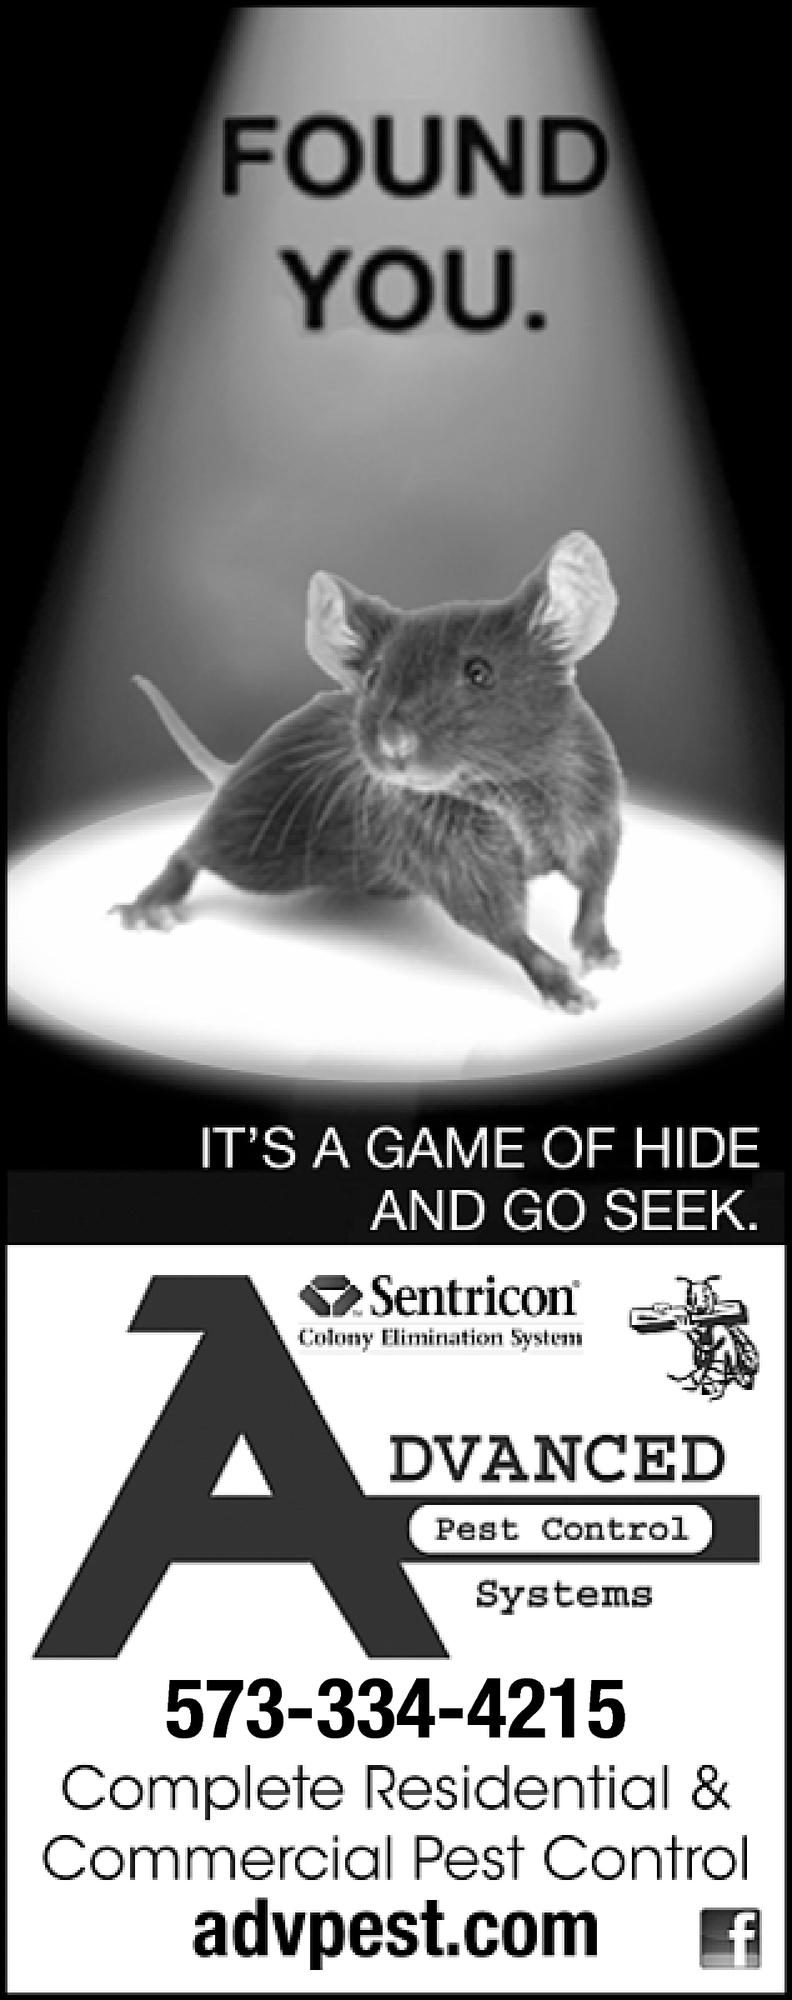 It's a Game of Hide & Go Seek